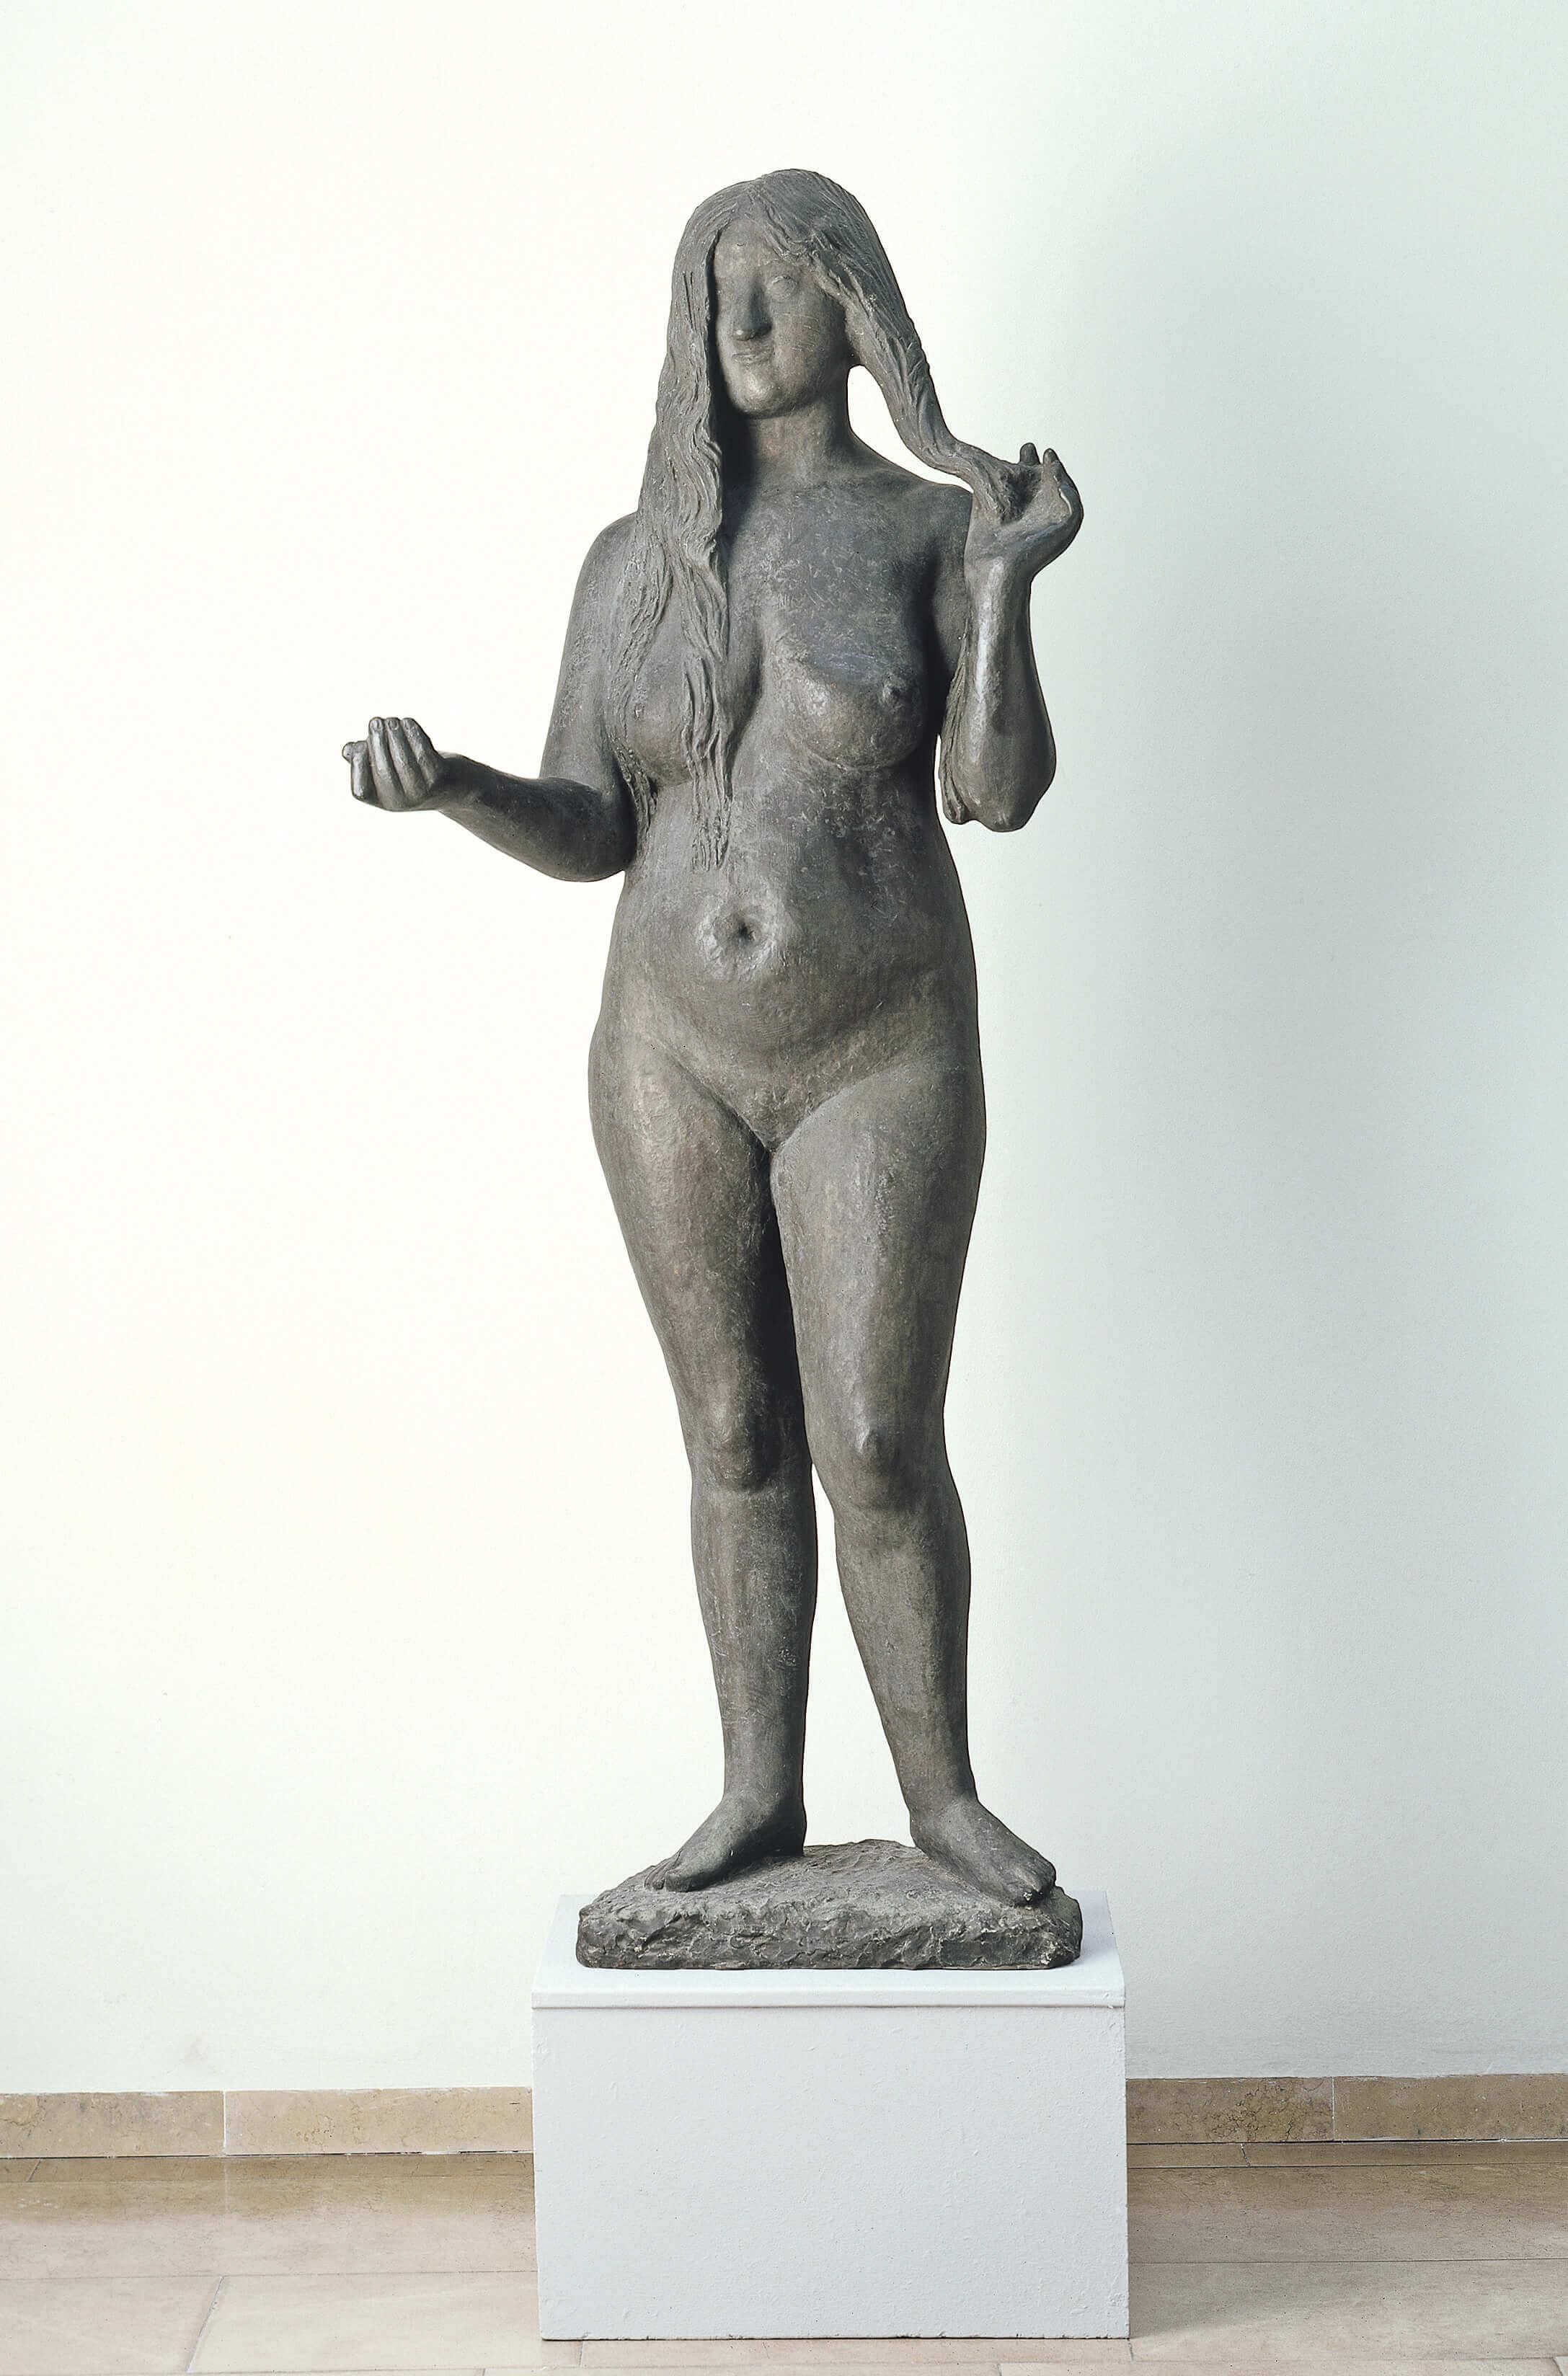 Gerhard Marcks, Thüringer Venus, 1930